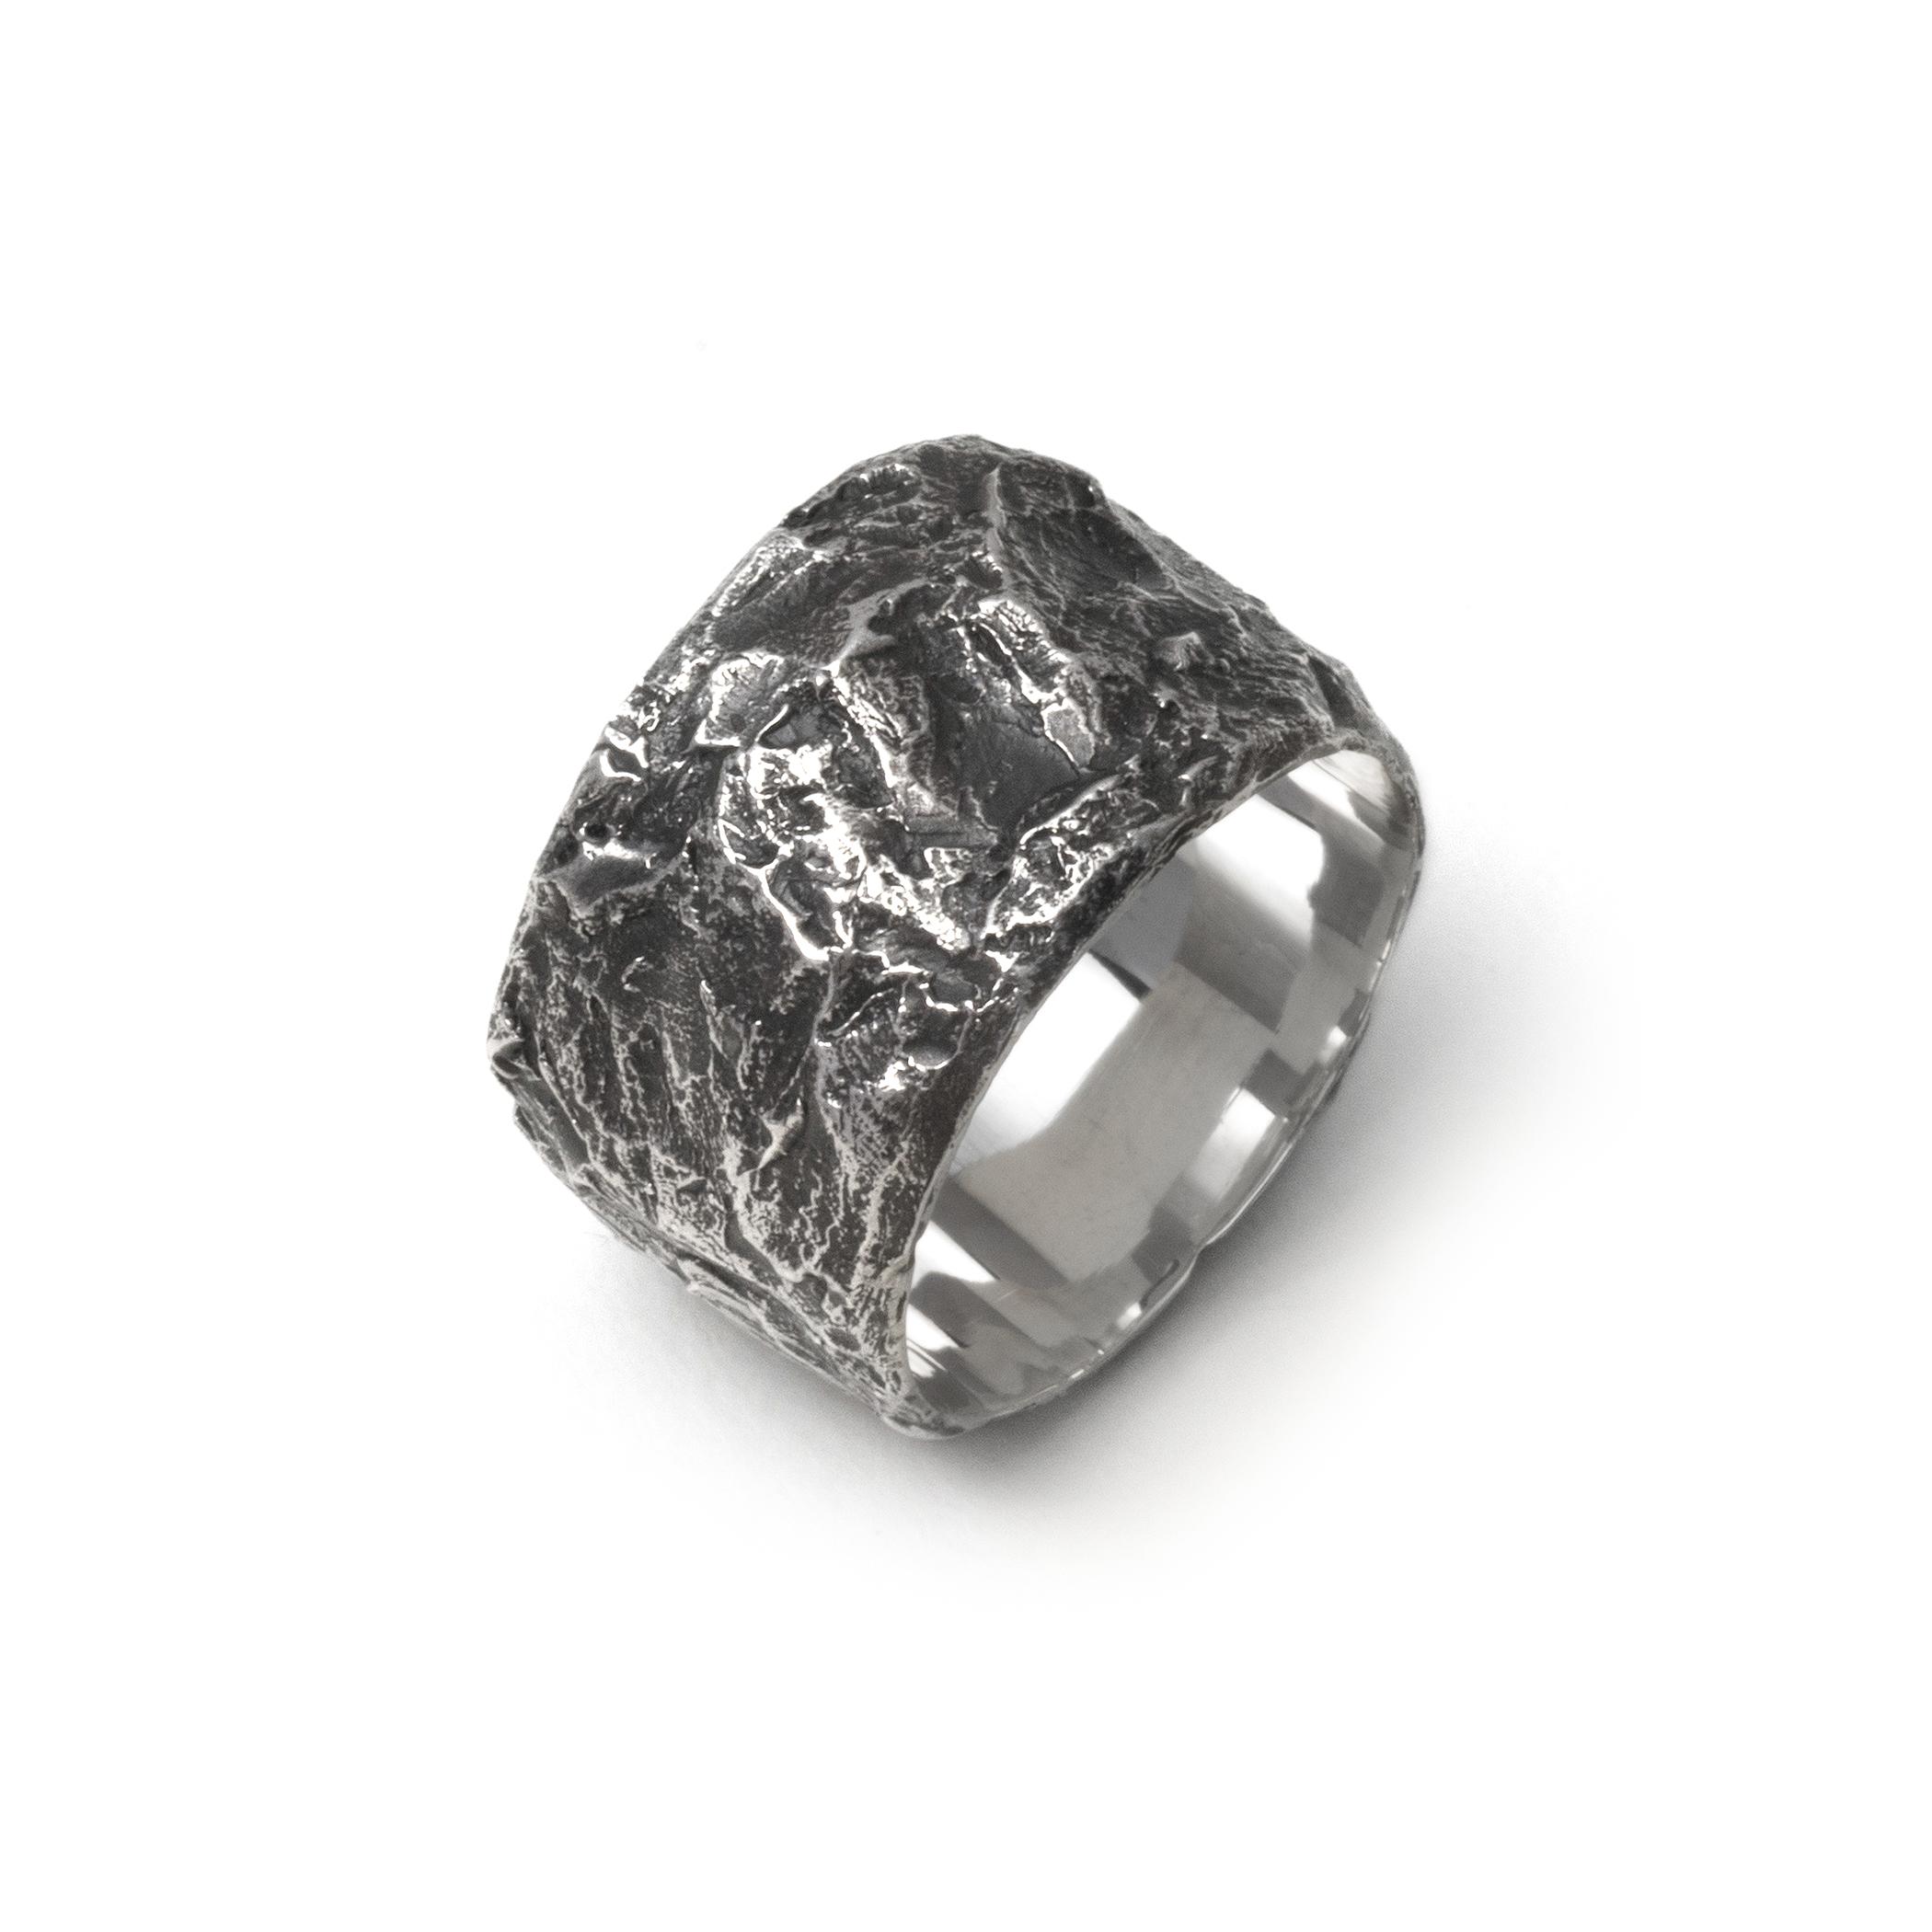 Anthracite Ring ALICIA HANNAH NAOMI Contemporary metal atelier